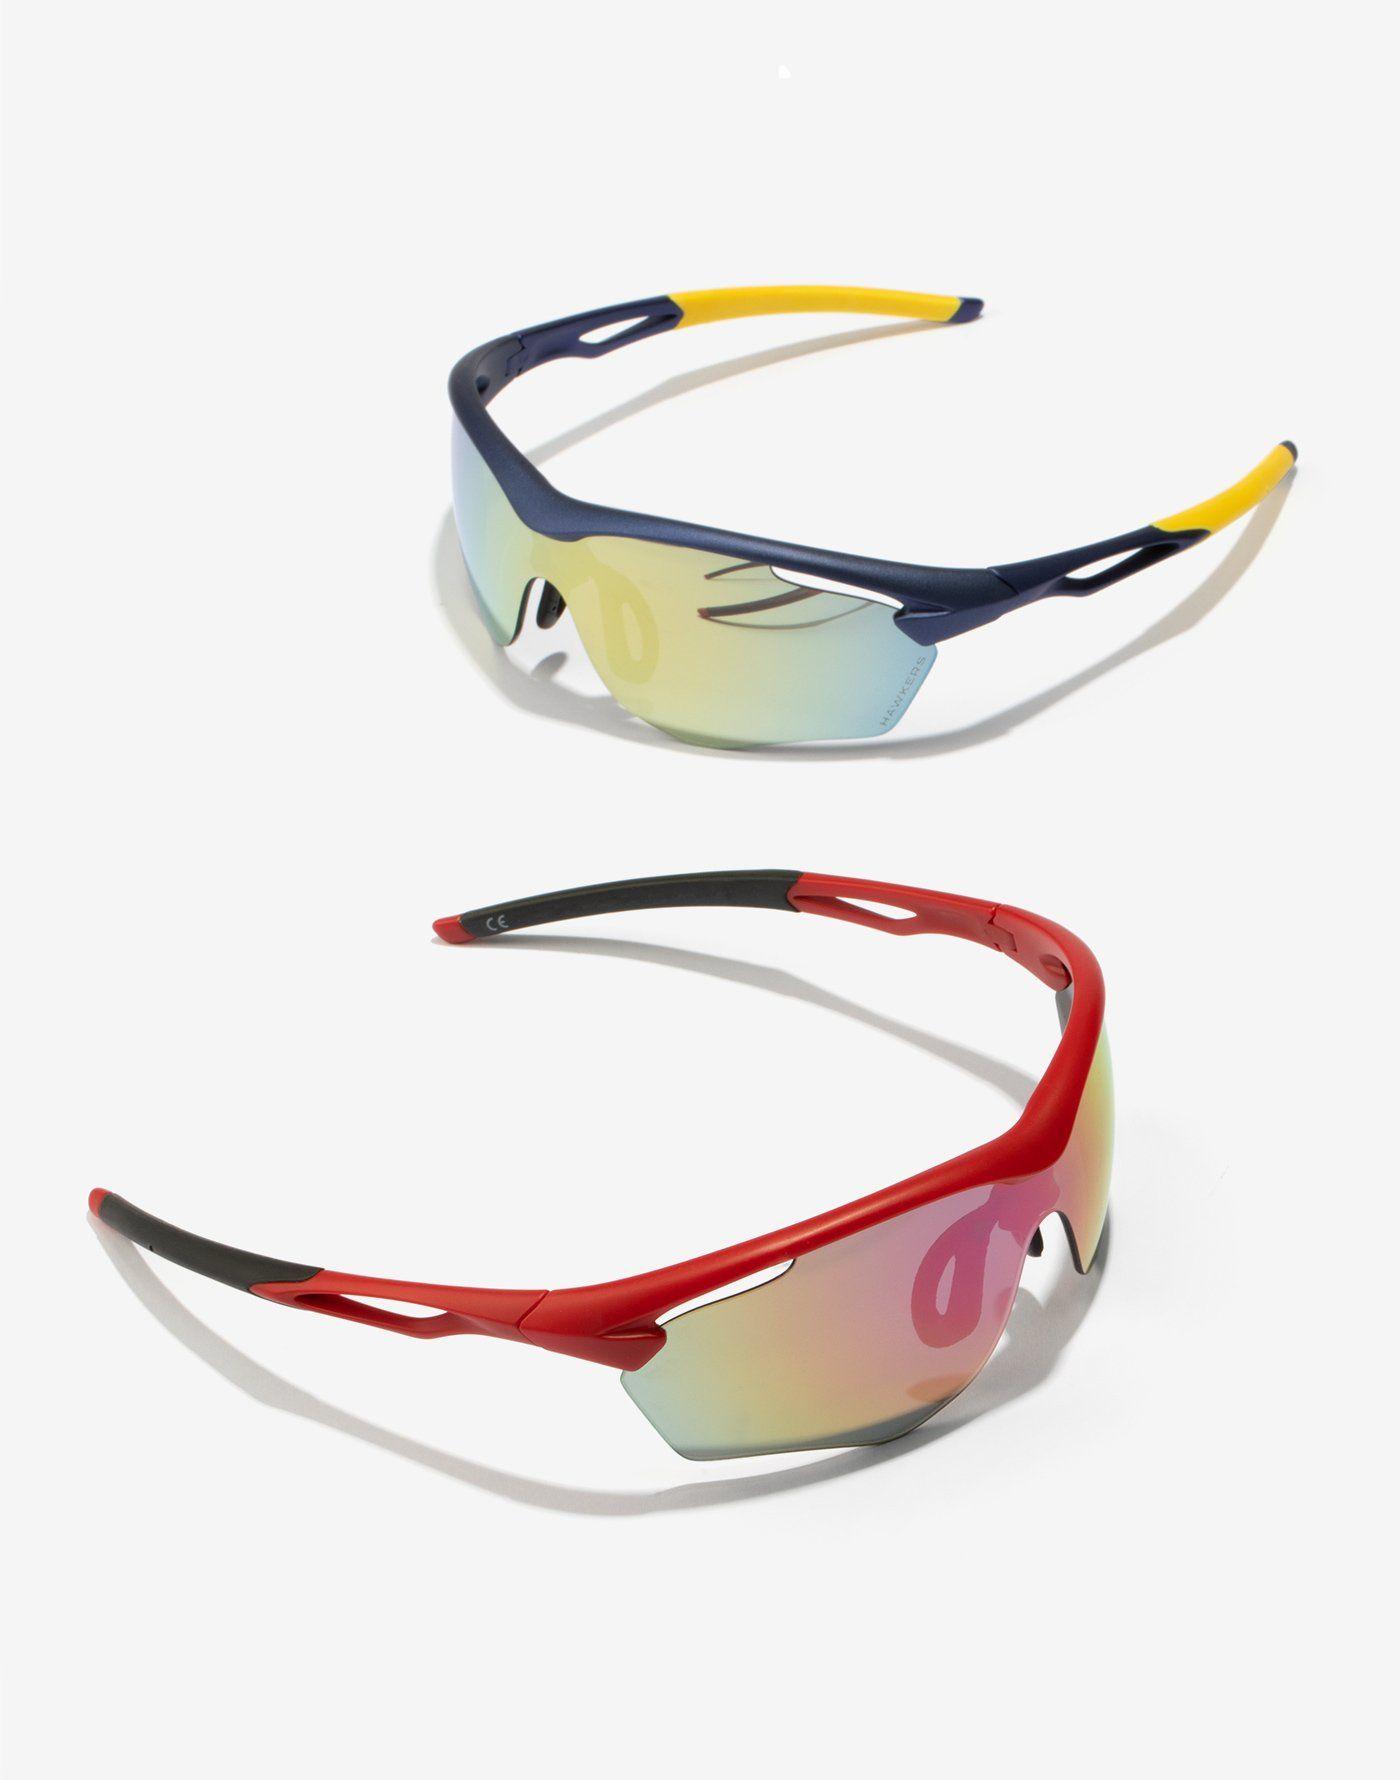 ebc9d71dfb RED NEBULA TRAINING Diseño deportivo de gafas de sol con montura semi al  aire rojo mate